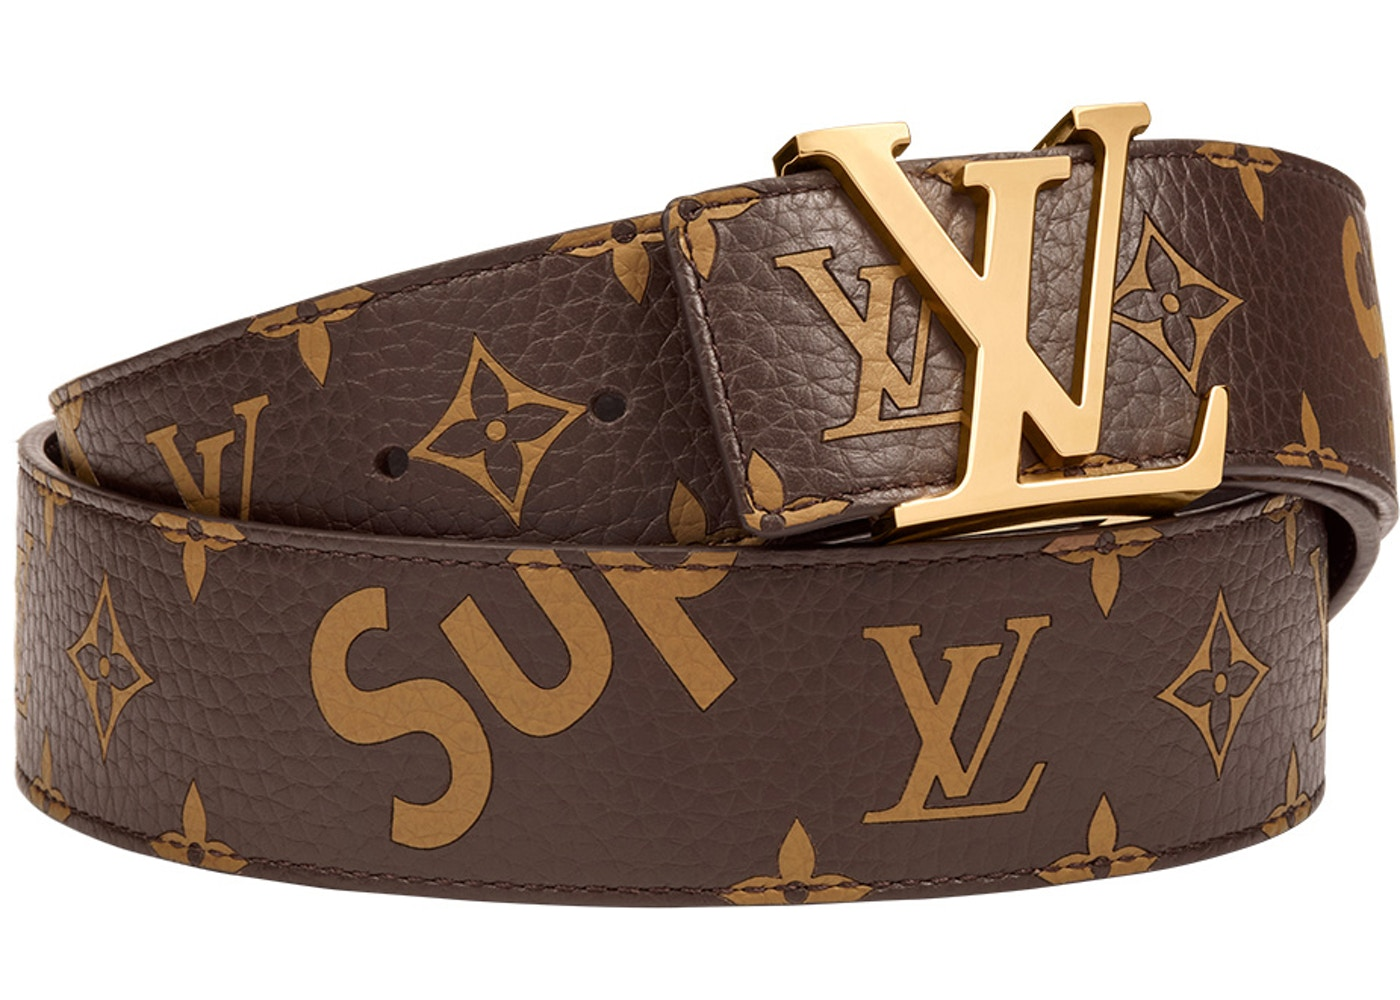 858fddf83ec Louis Vuitton x Supreme Initiales Belt 40 MM Monogram Brown Gold